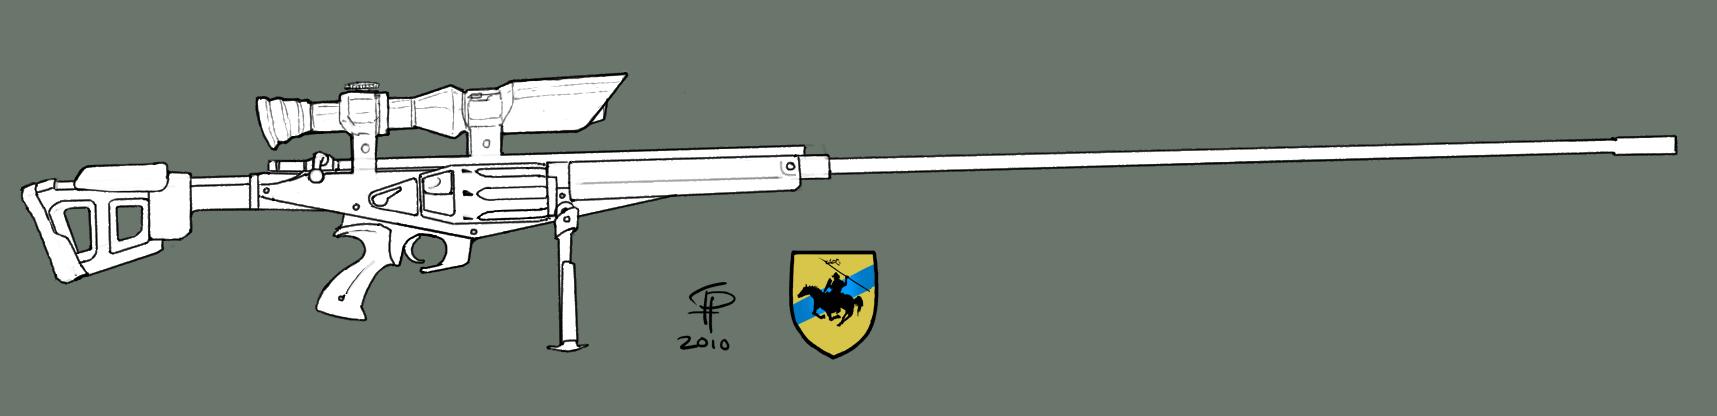 SMX-15 Raptor by Pyrosity